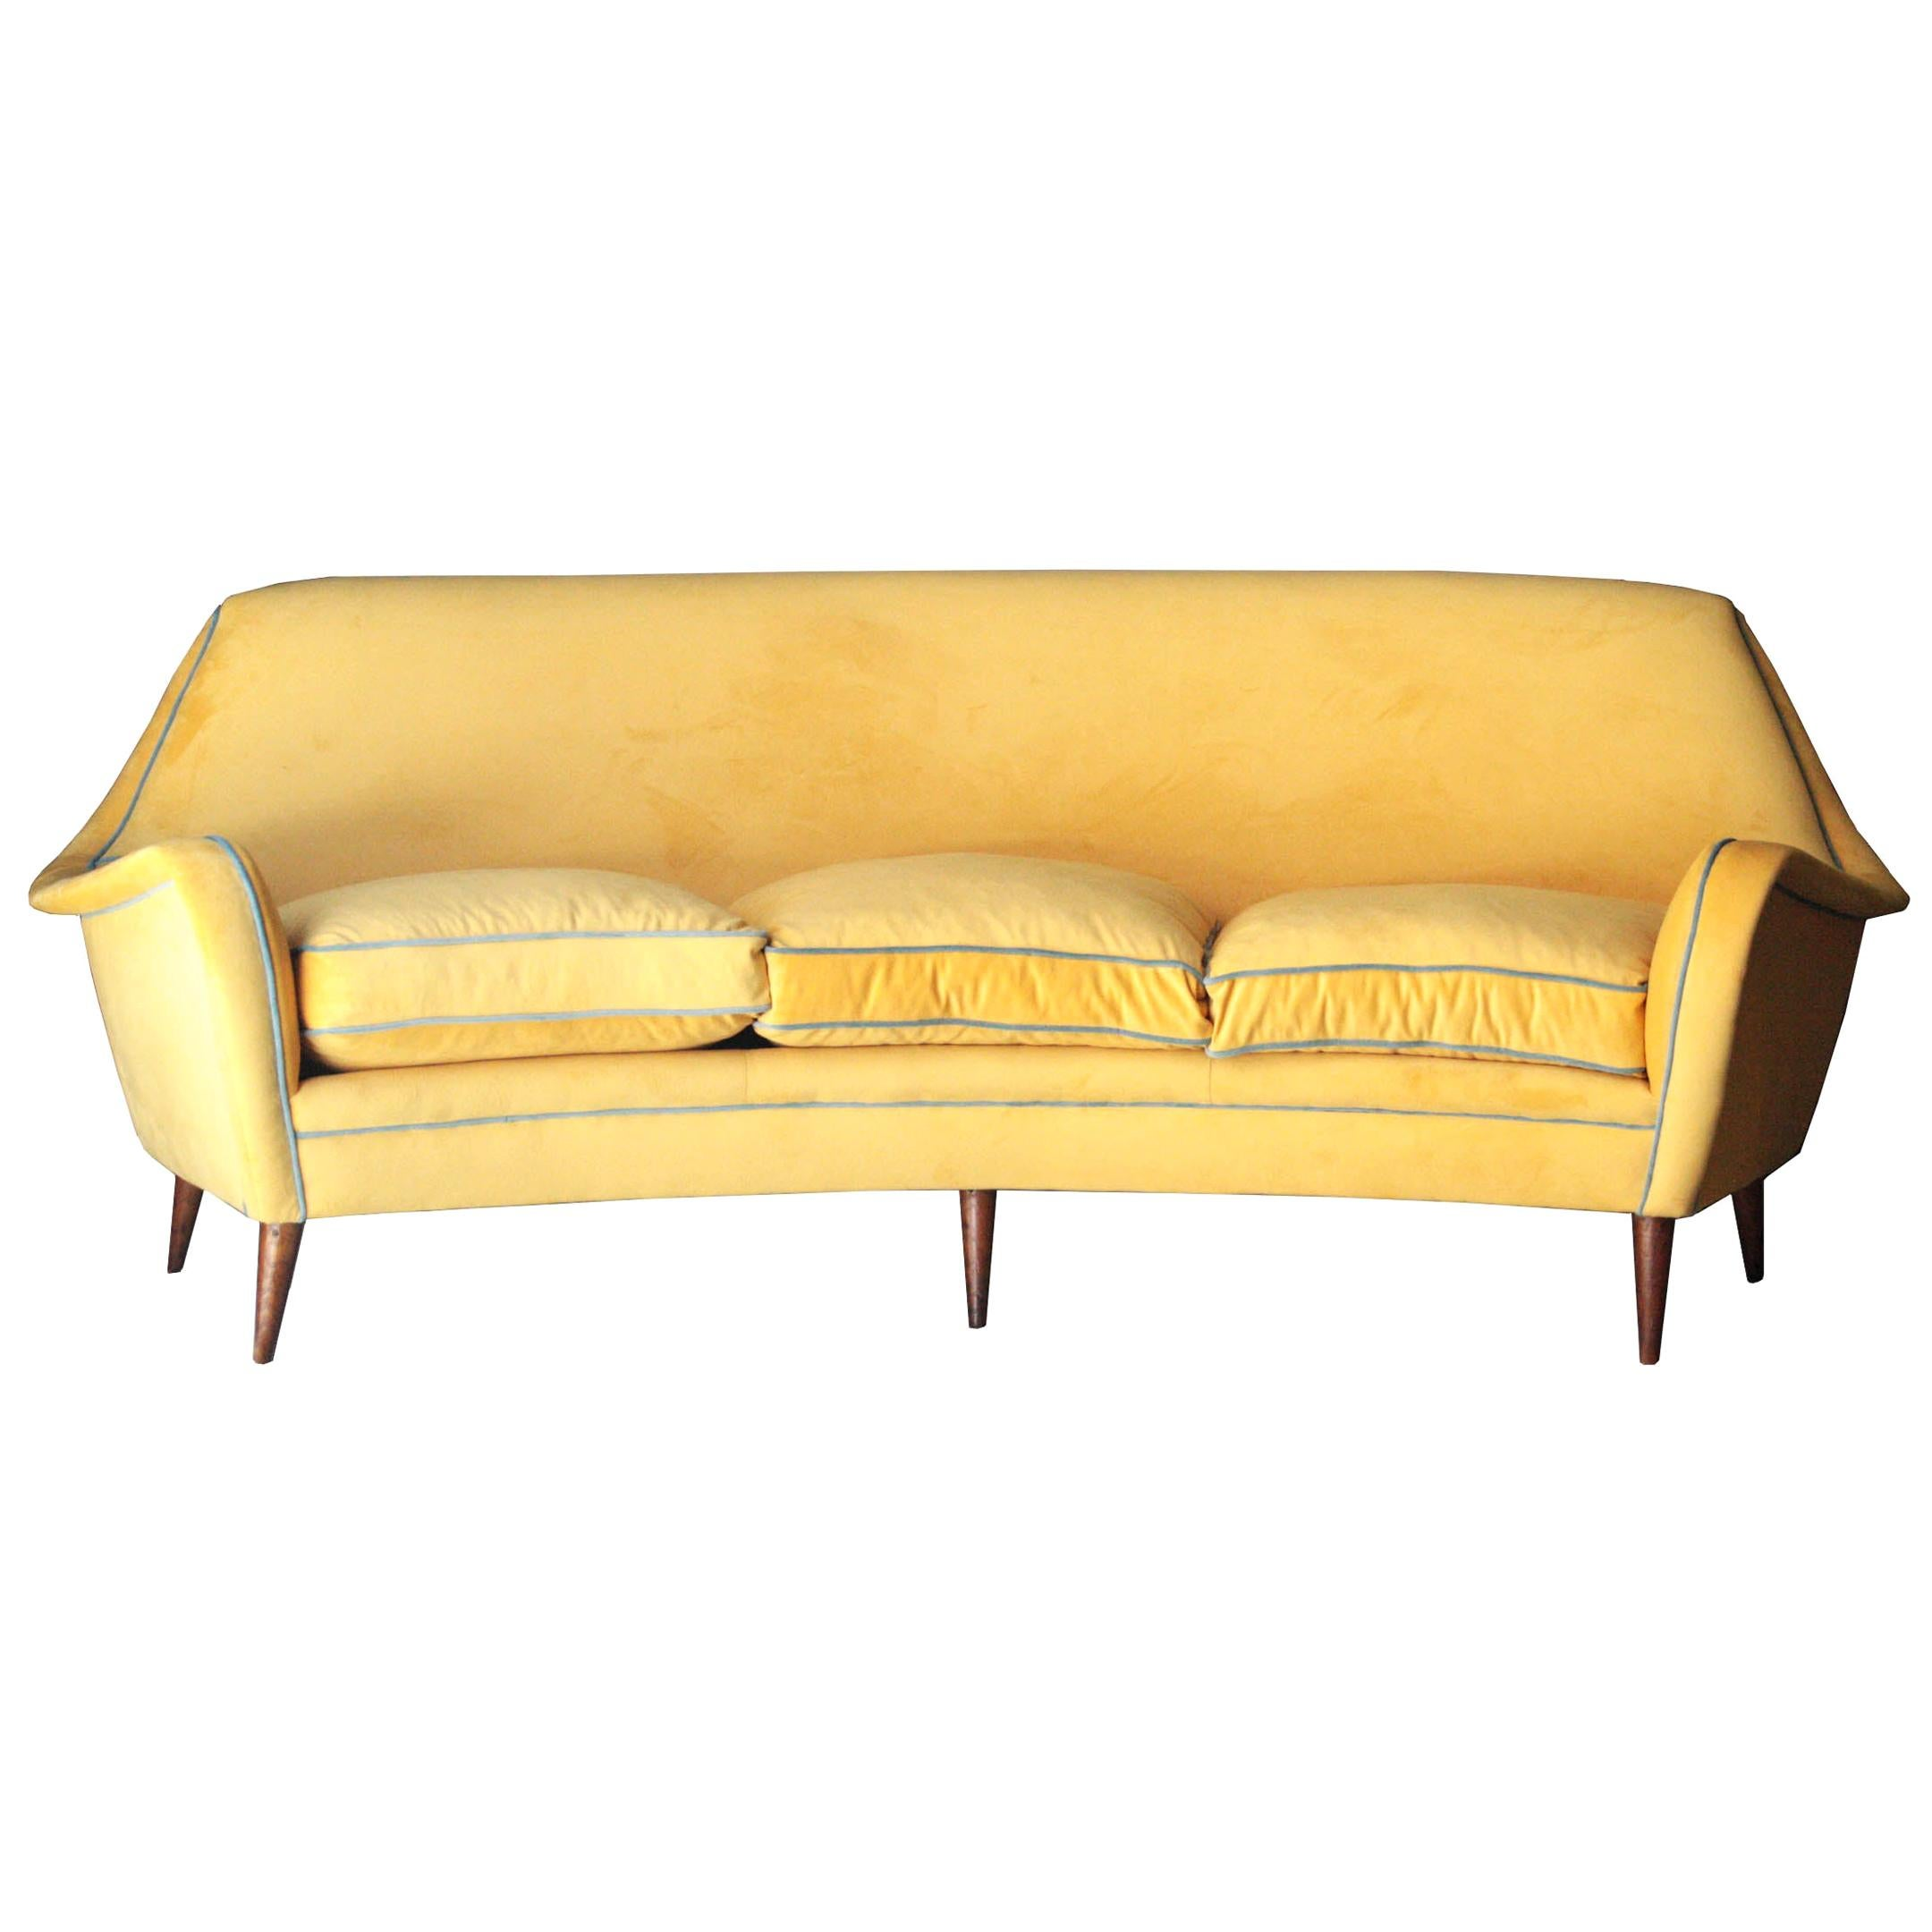 L.A. Studio Contemporary Yellow Cotton Velvet Curved Italian Sofa